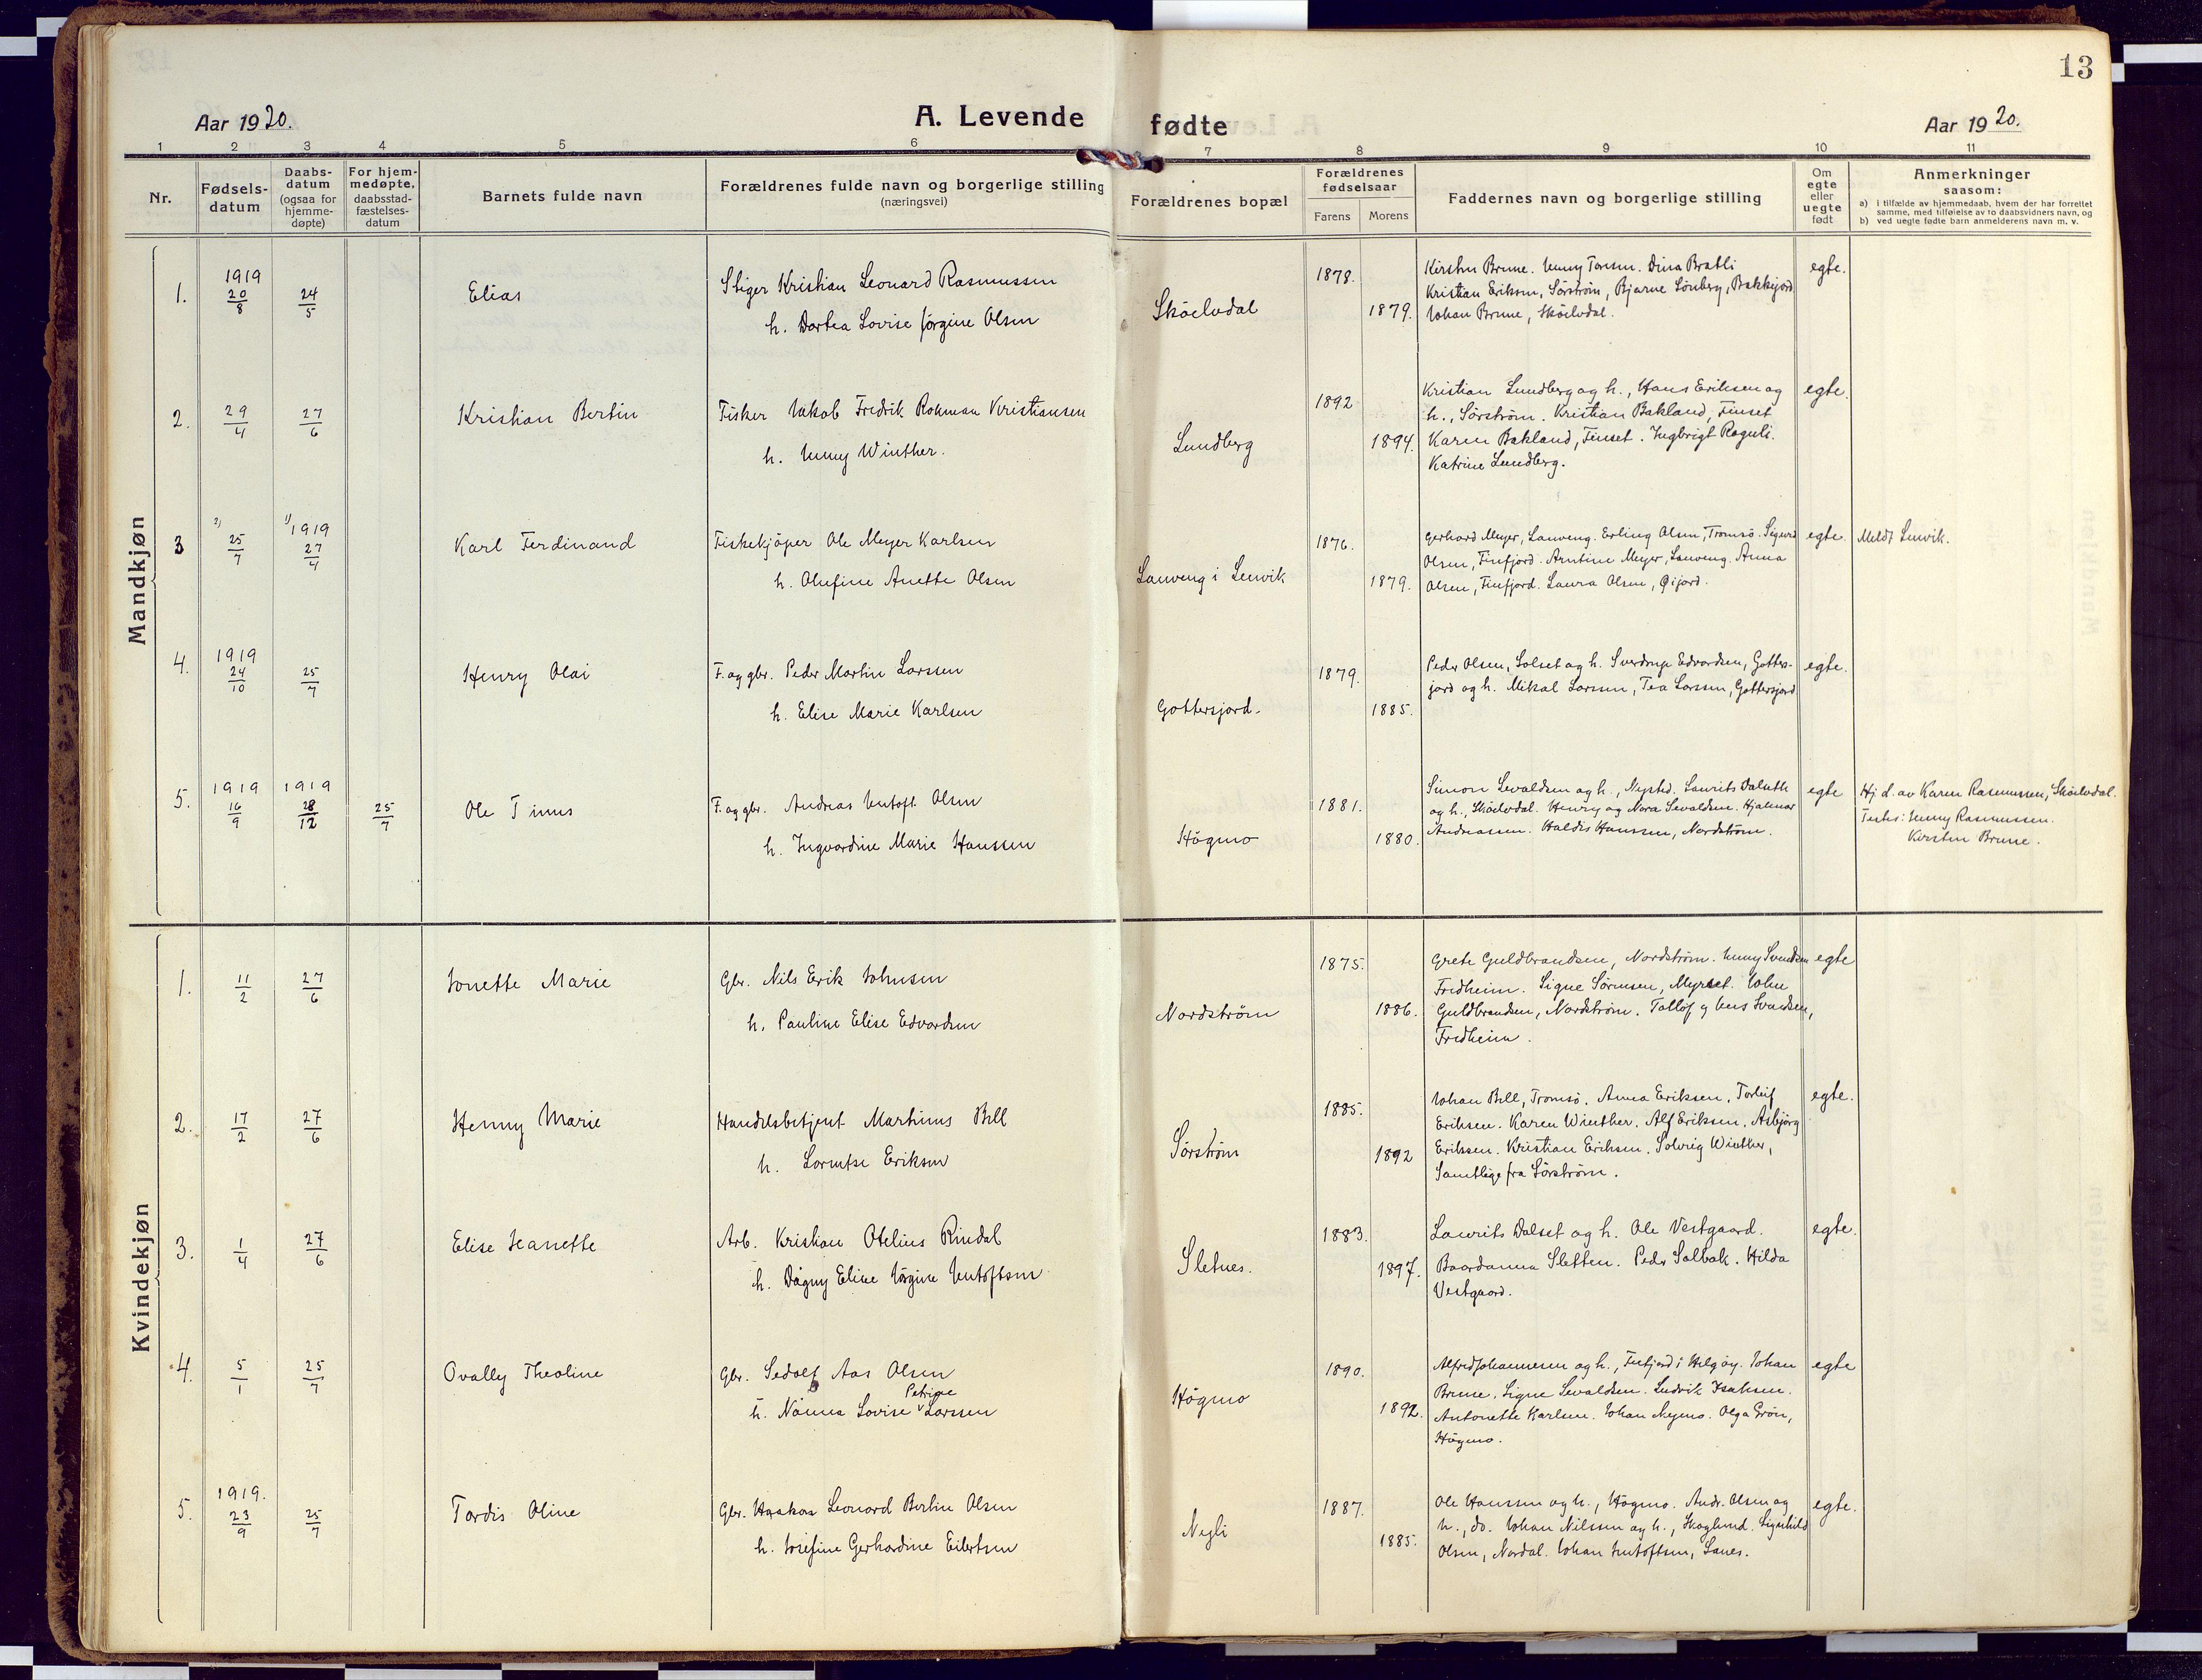 SATØ, Tranøy sokneprestkontor, I/Ia/Iaa/L0015kirke: Ministerialbok nr. 15, 1919-1928, s. 13